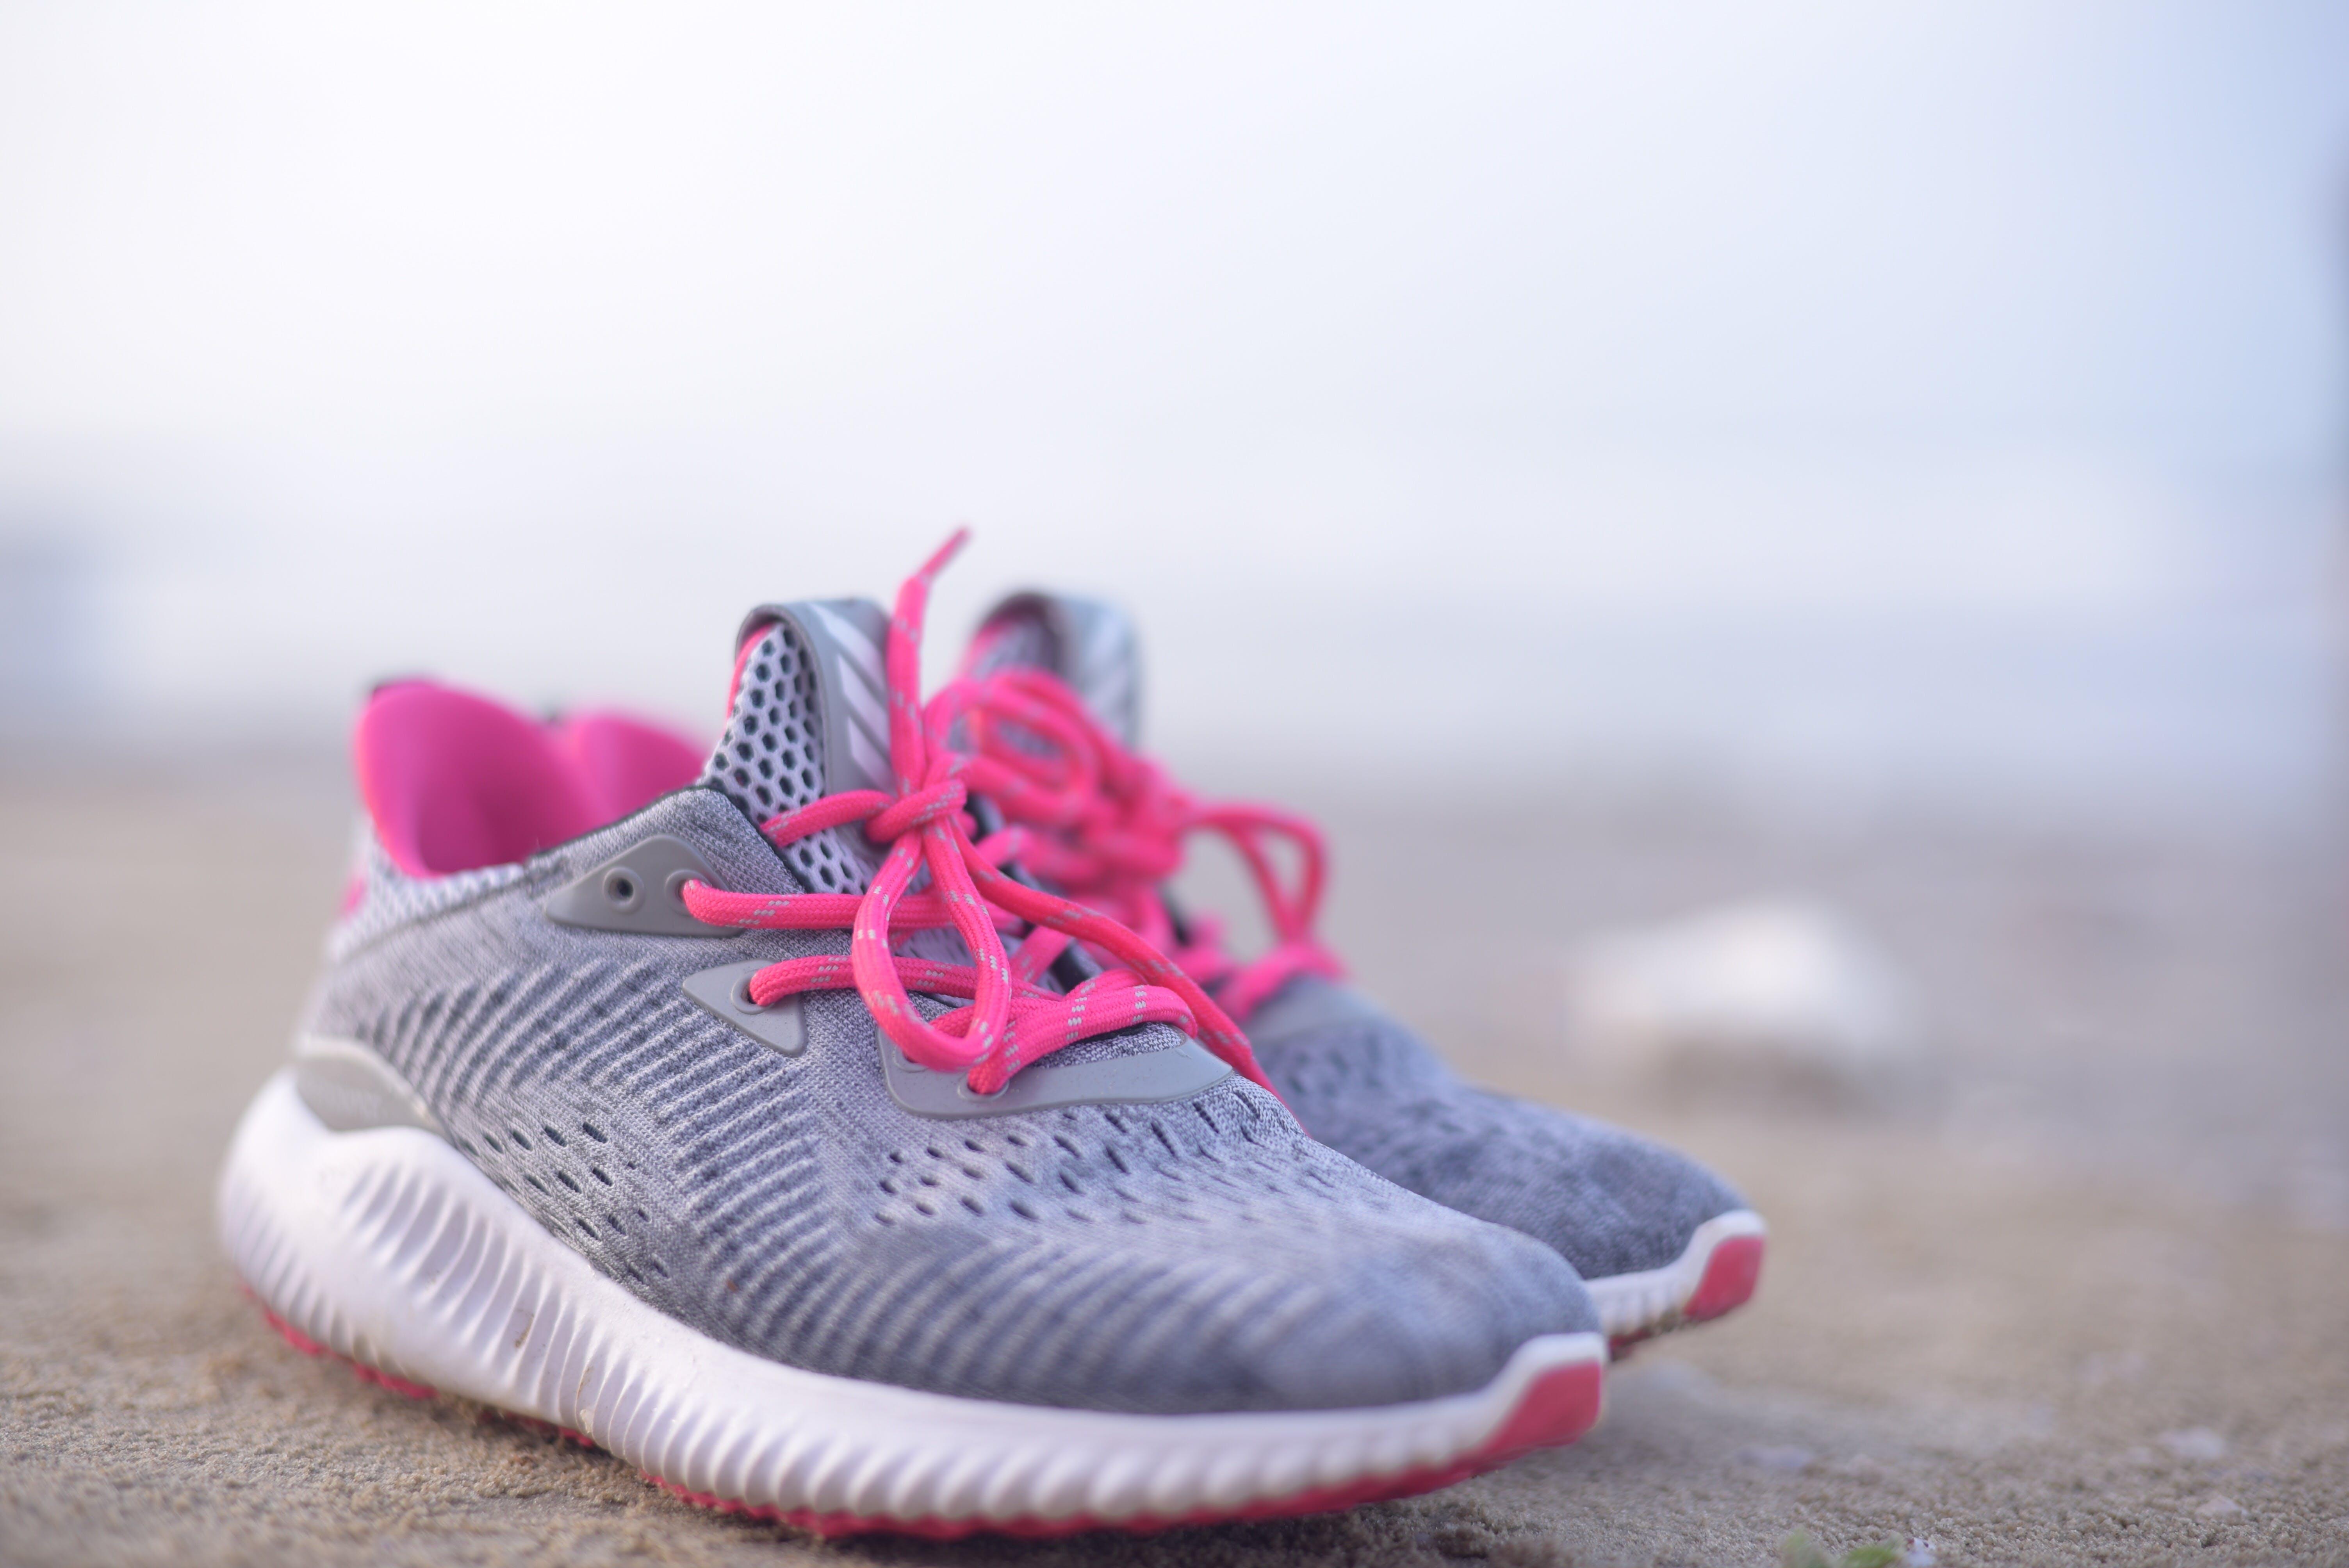 Kostenloses Stock Foto zu fußbekleidung, makro, sneakers